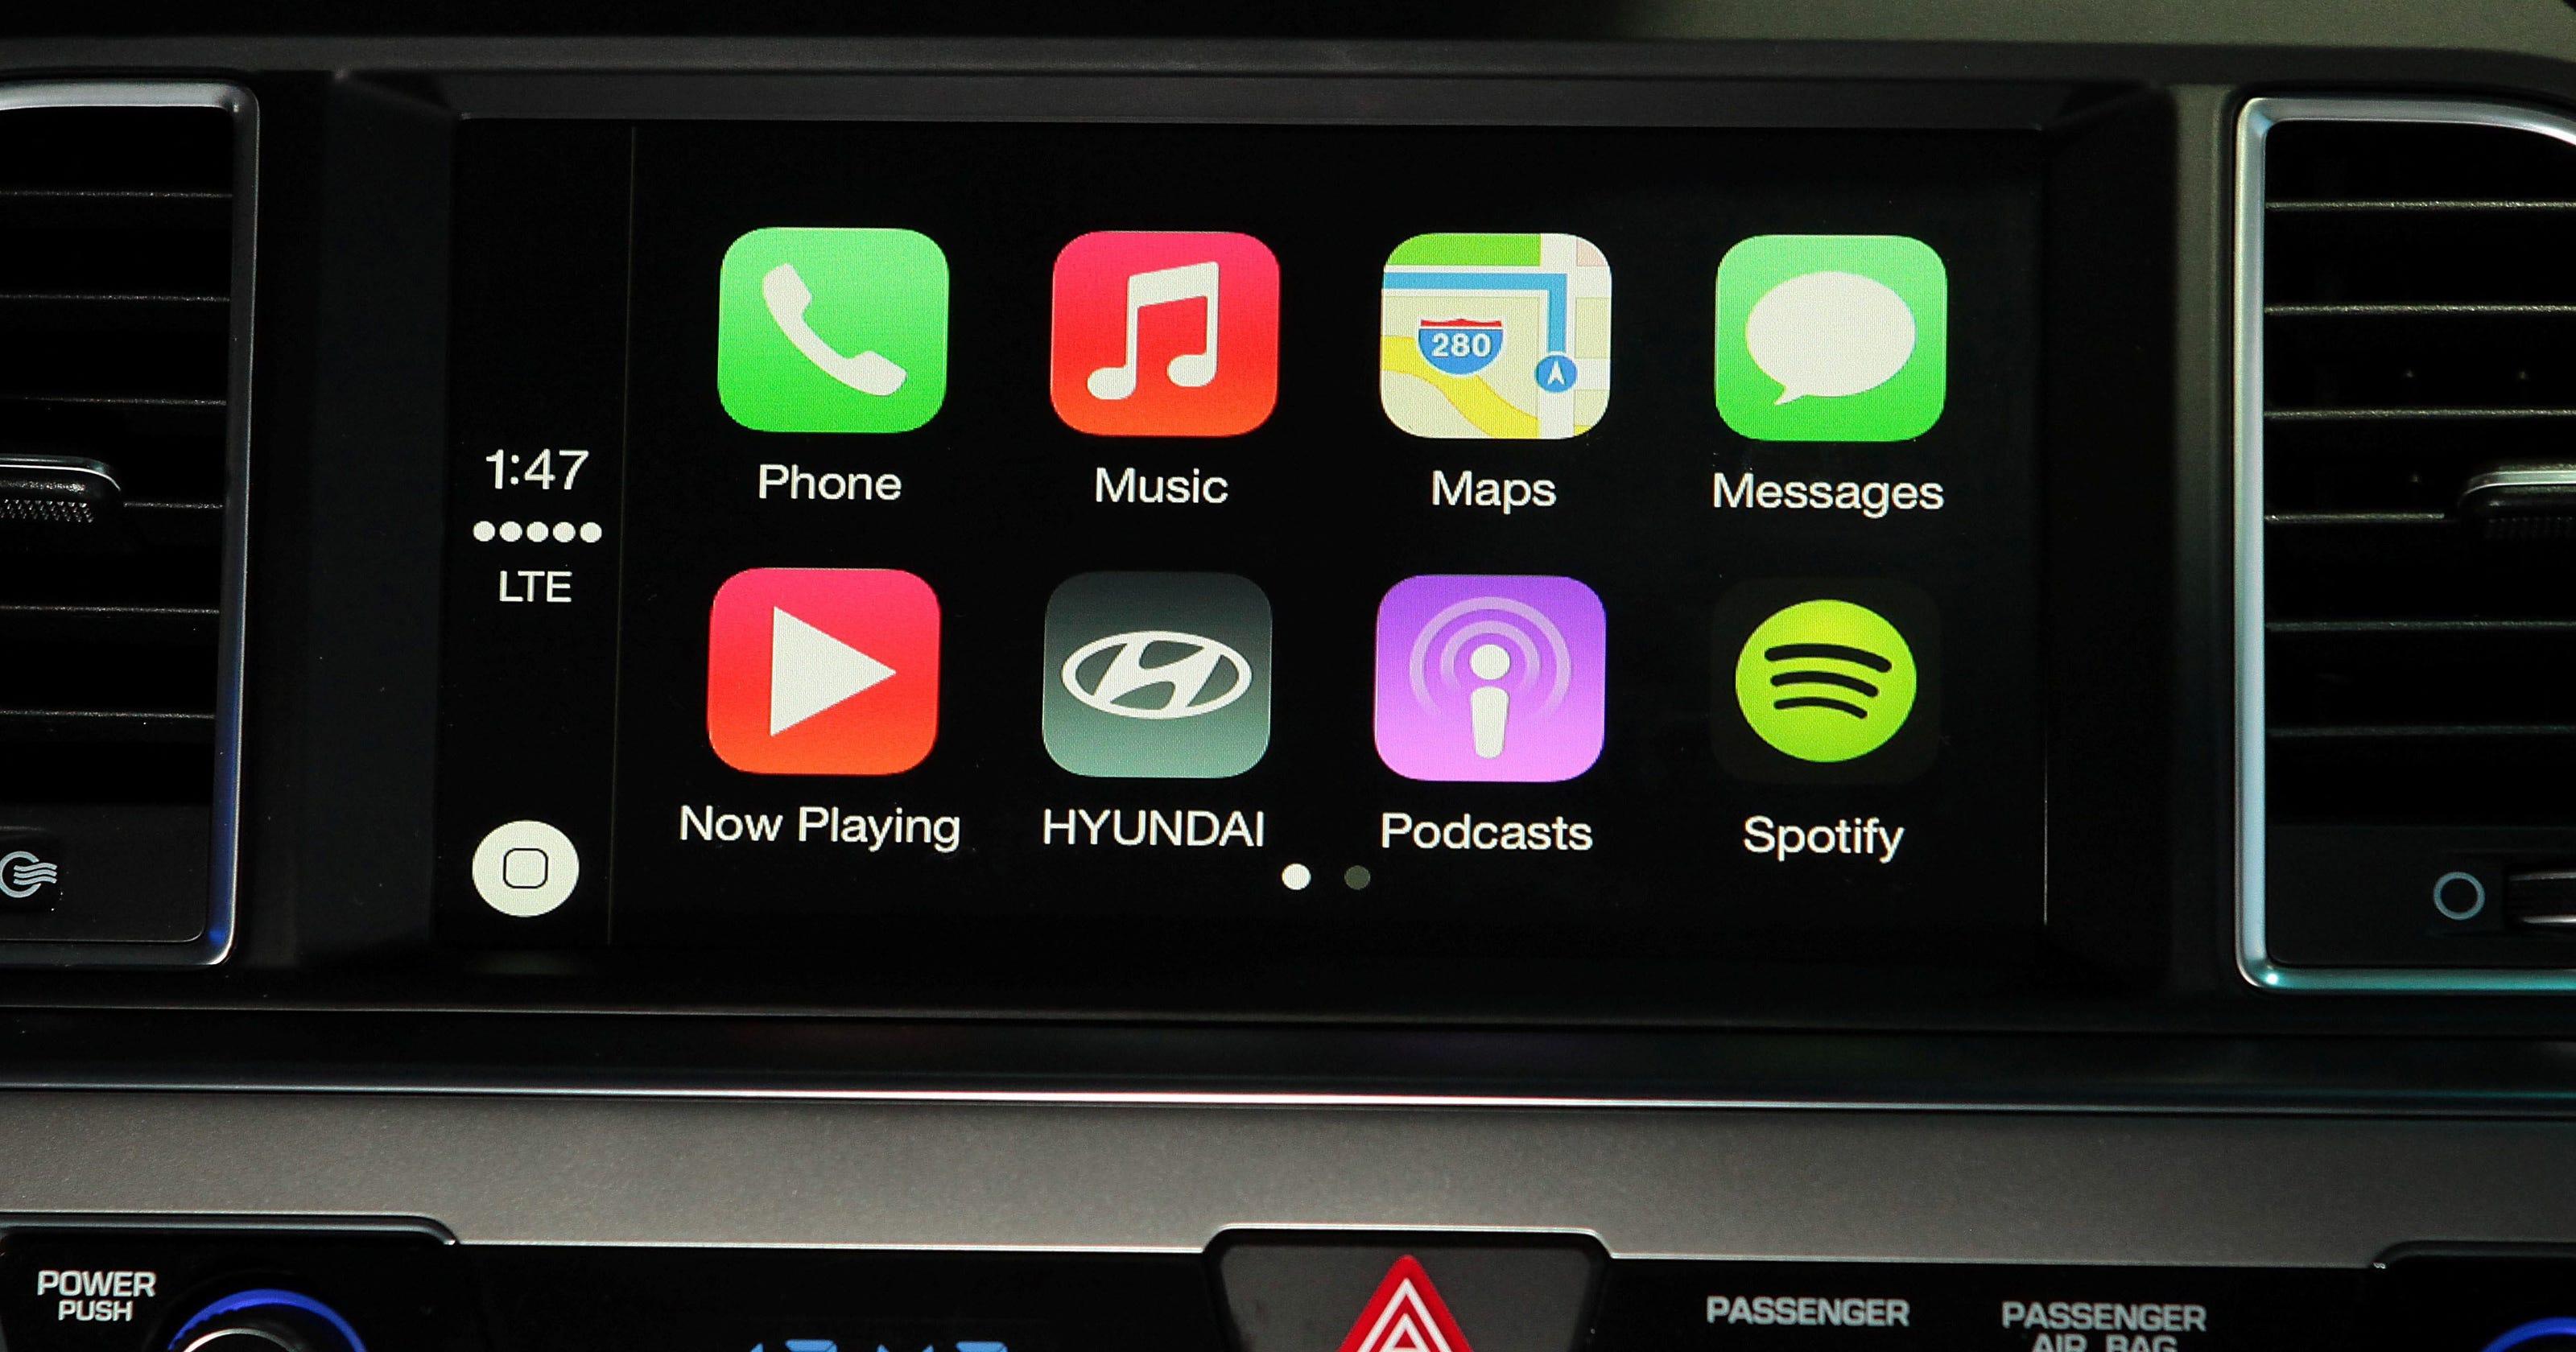 Hyundai promises Apple CarPlay in Q1 2016, at a price